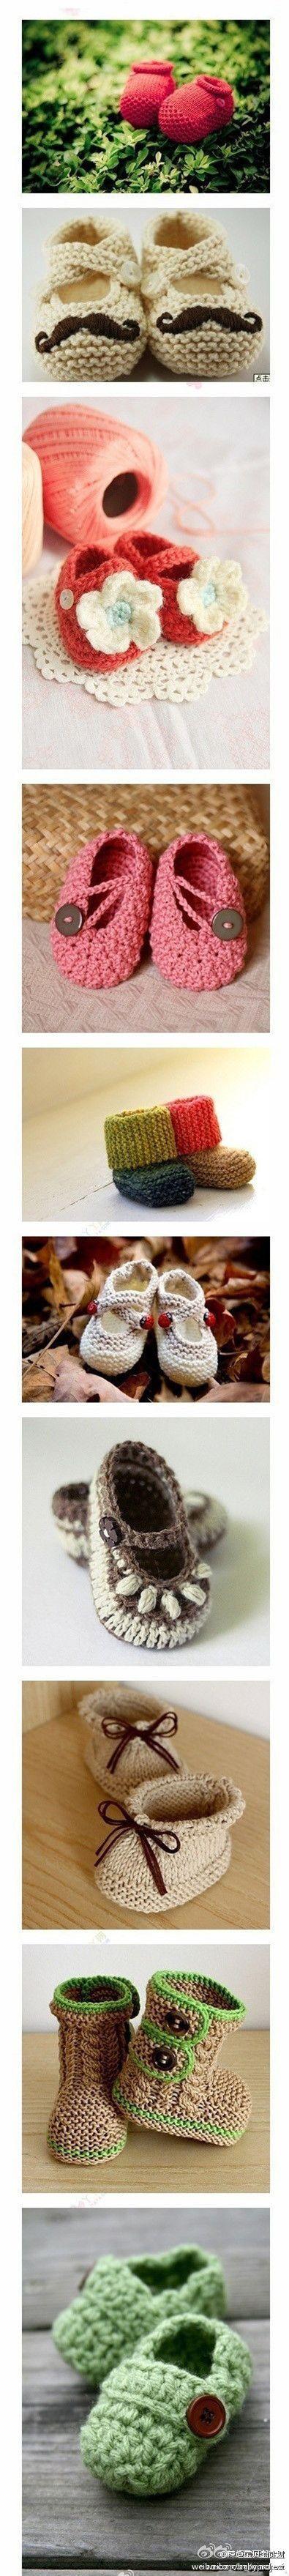 Crochet baby booties...makes me wish I new how to crochet! | DIY ...